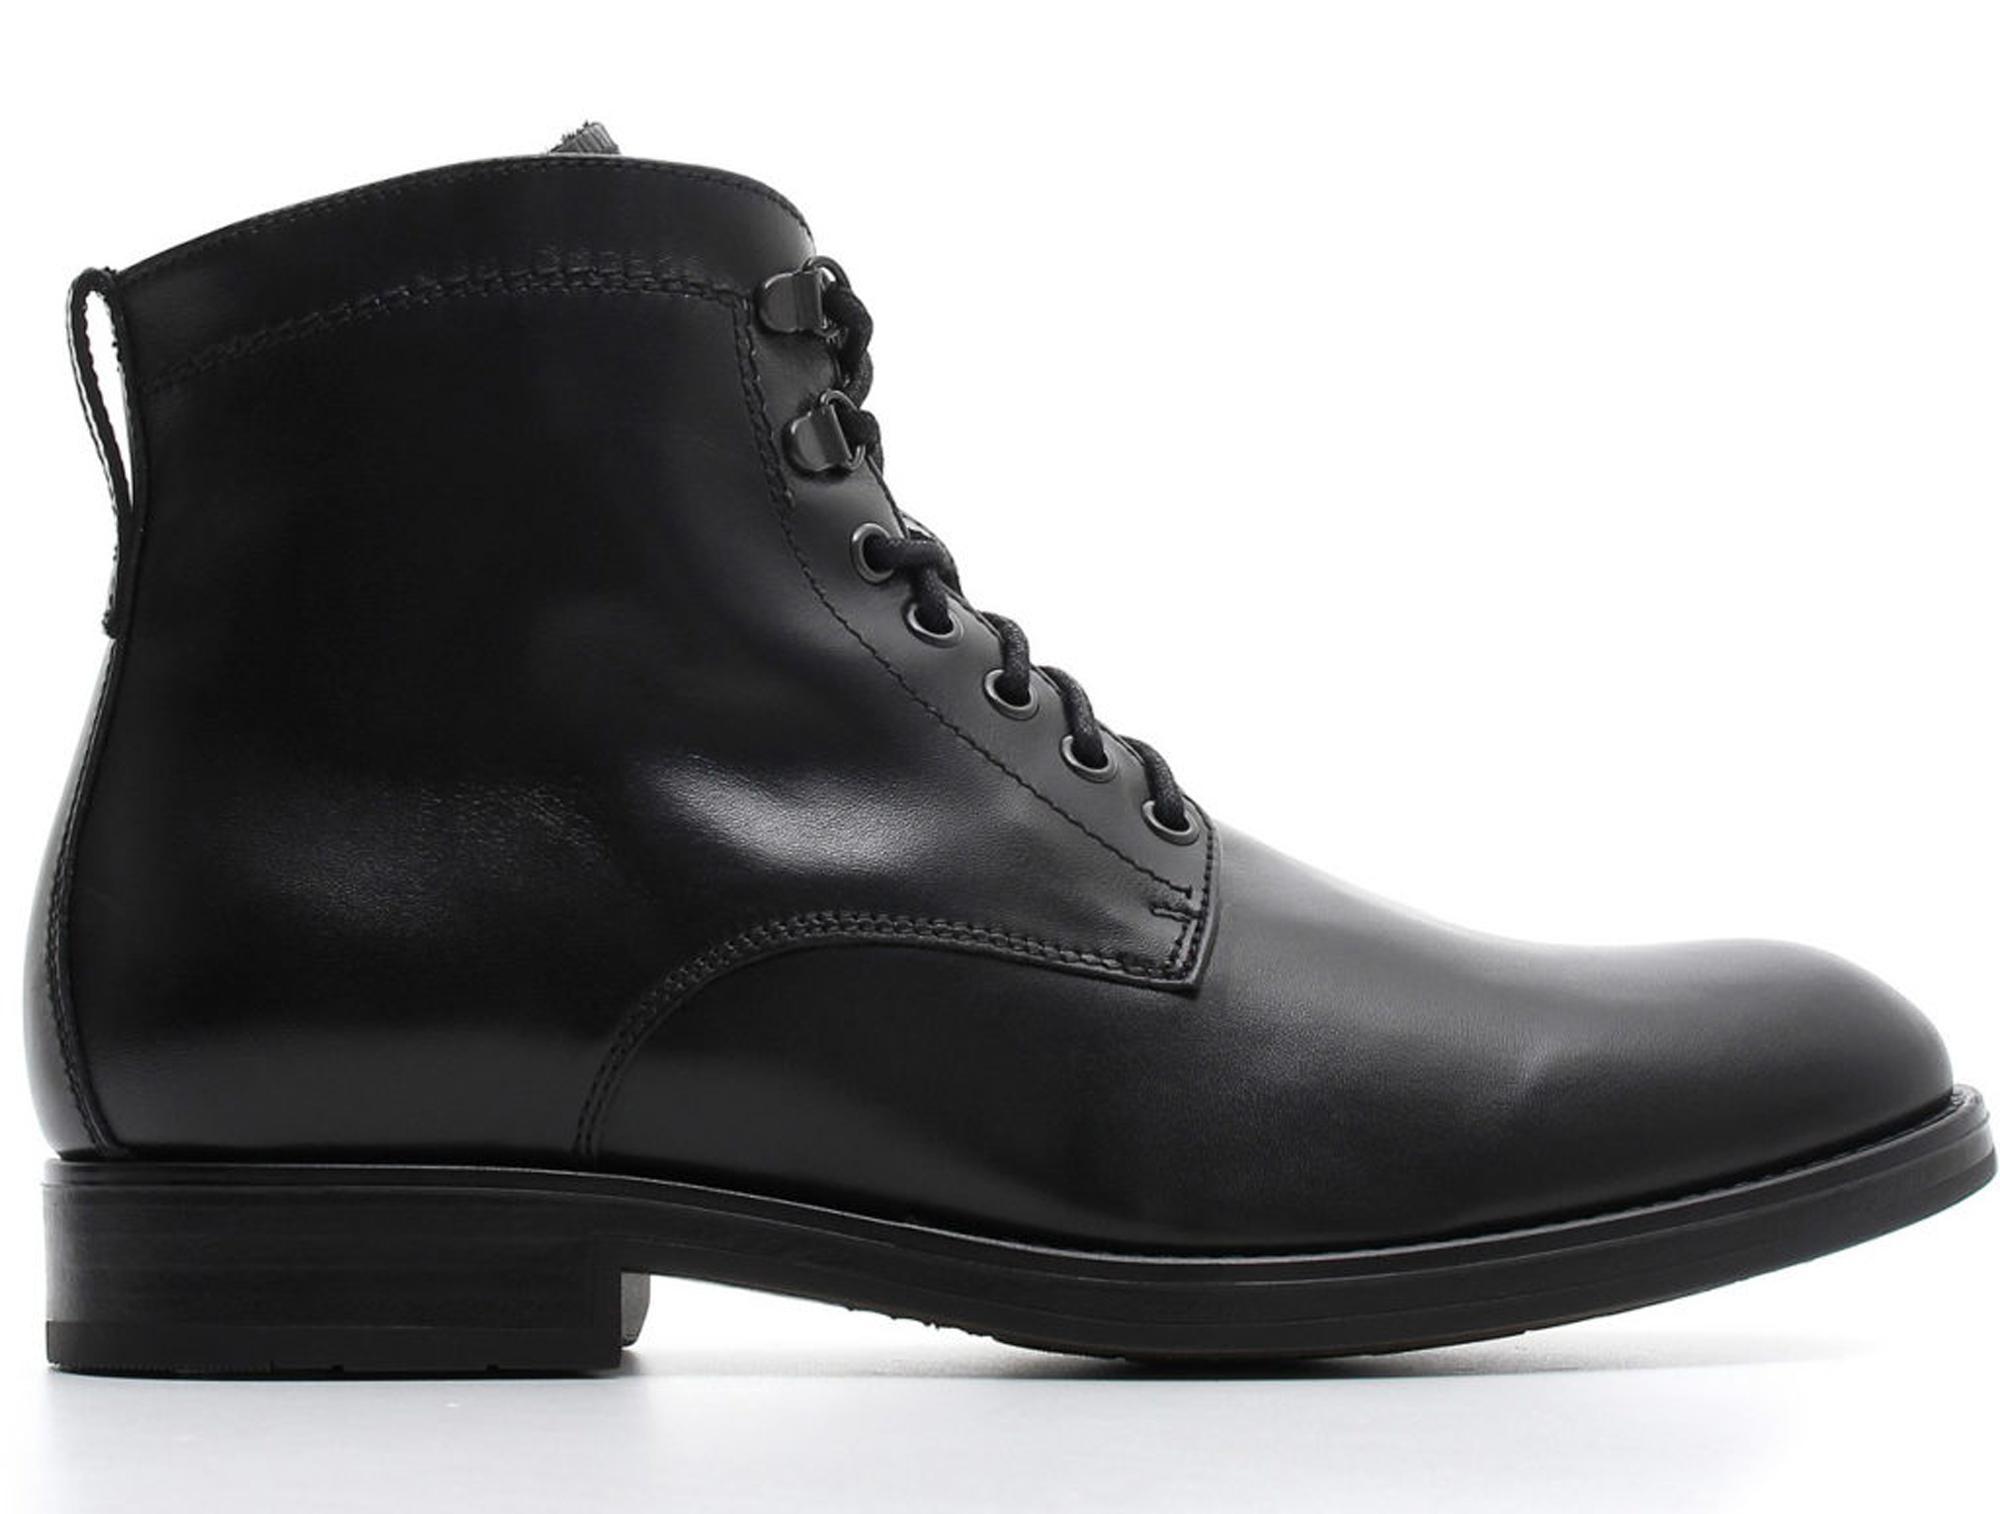 Polacchini NeroGiardini A800533-100 0533 scarpe uomo in pelle nera ... 14be64c2afe